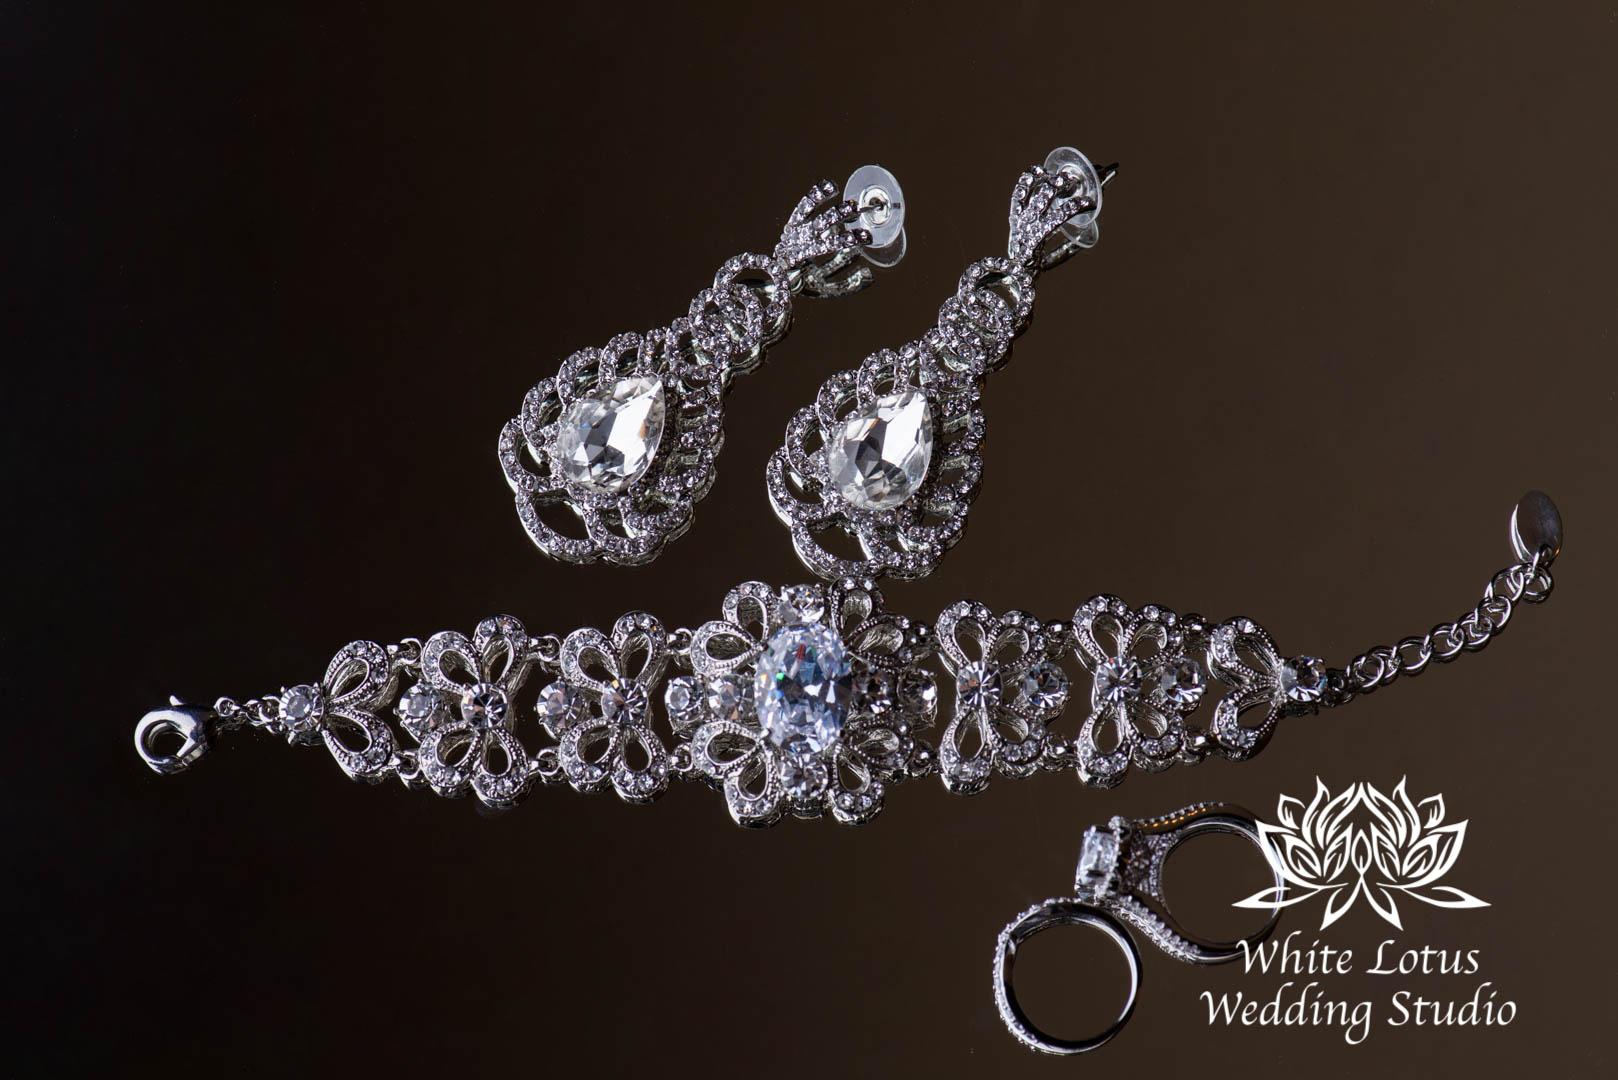 182- GLAM WINTERLUXE WEDDING INSPIRATION